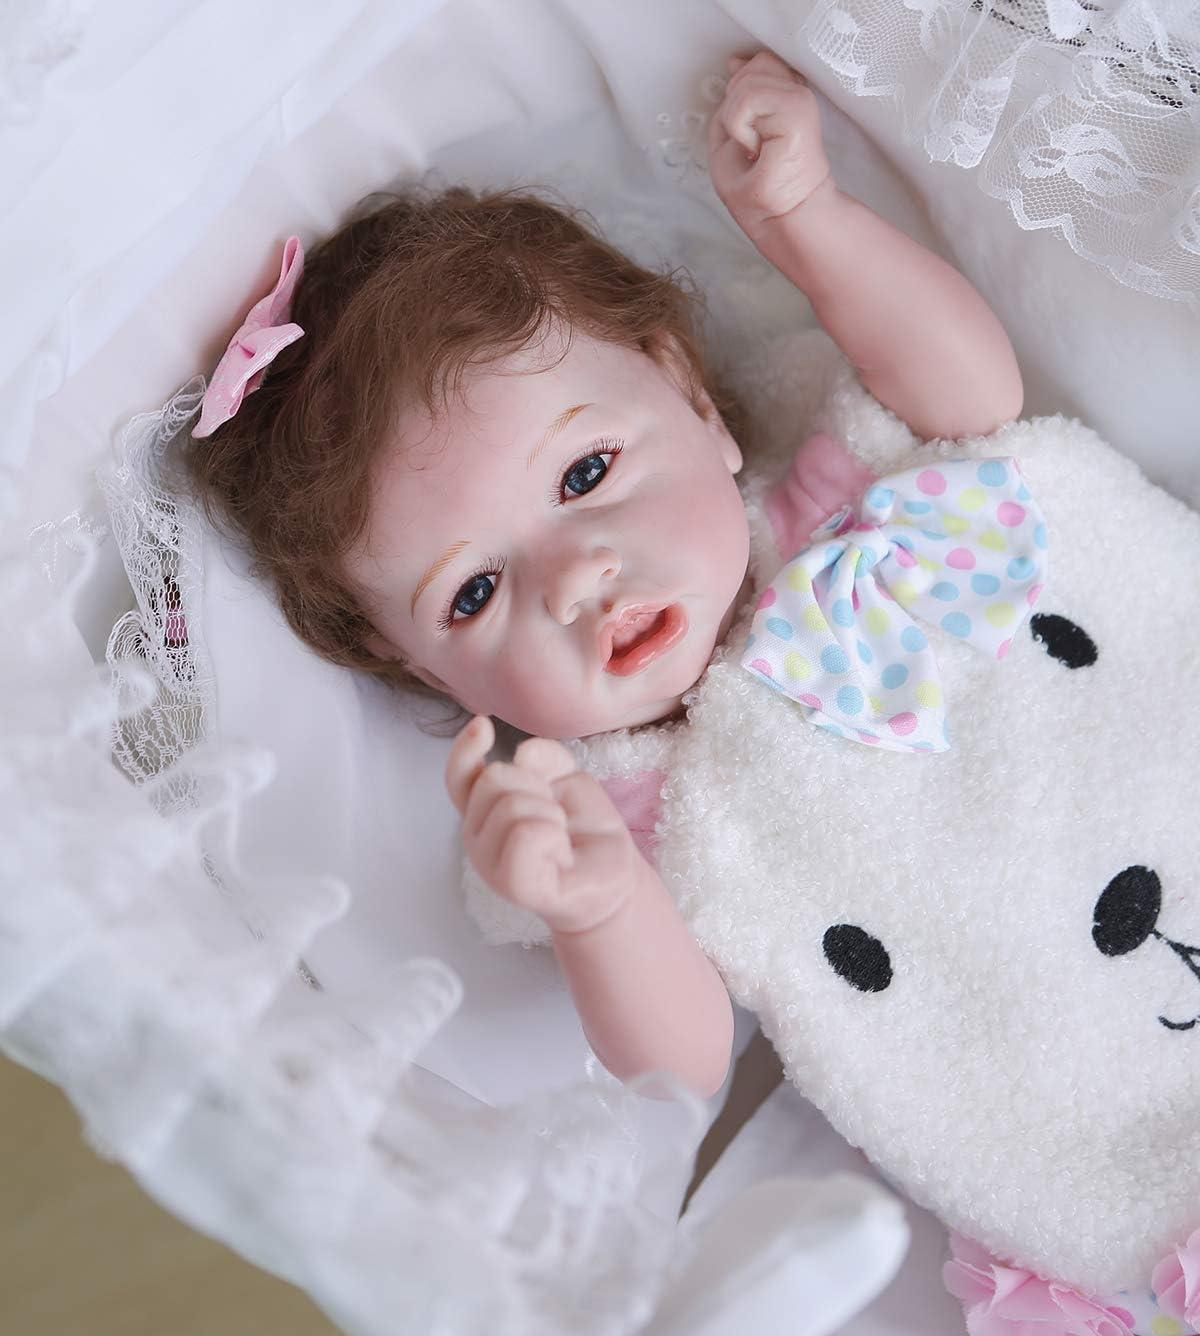 Anatomically Correct Reborn Baby Dolls Silicone Vinyl Full Body Girls Blue Eyes